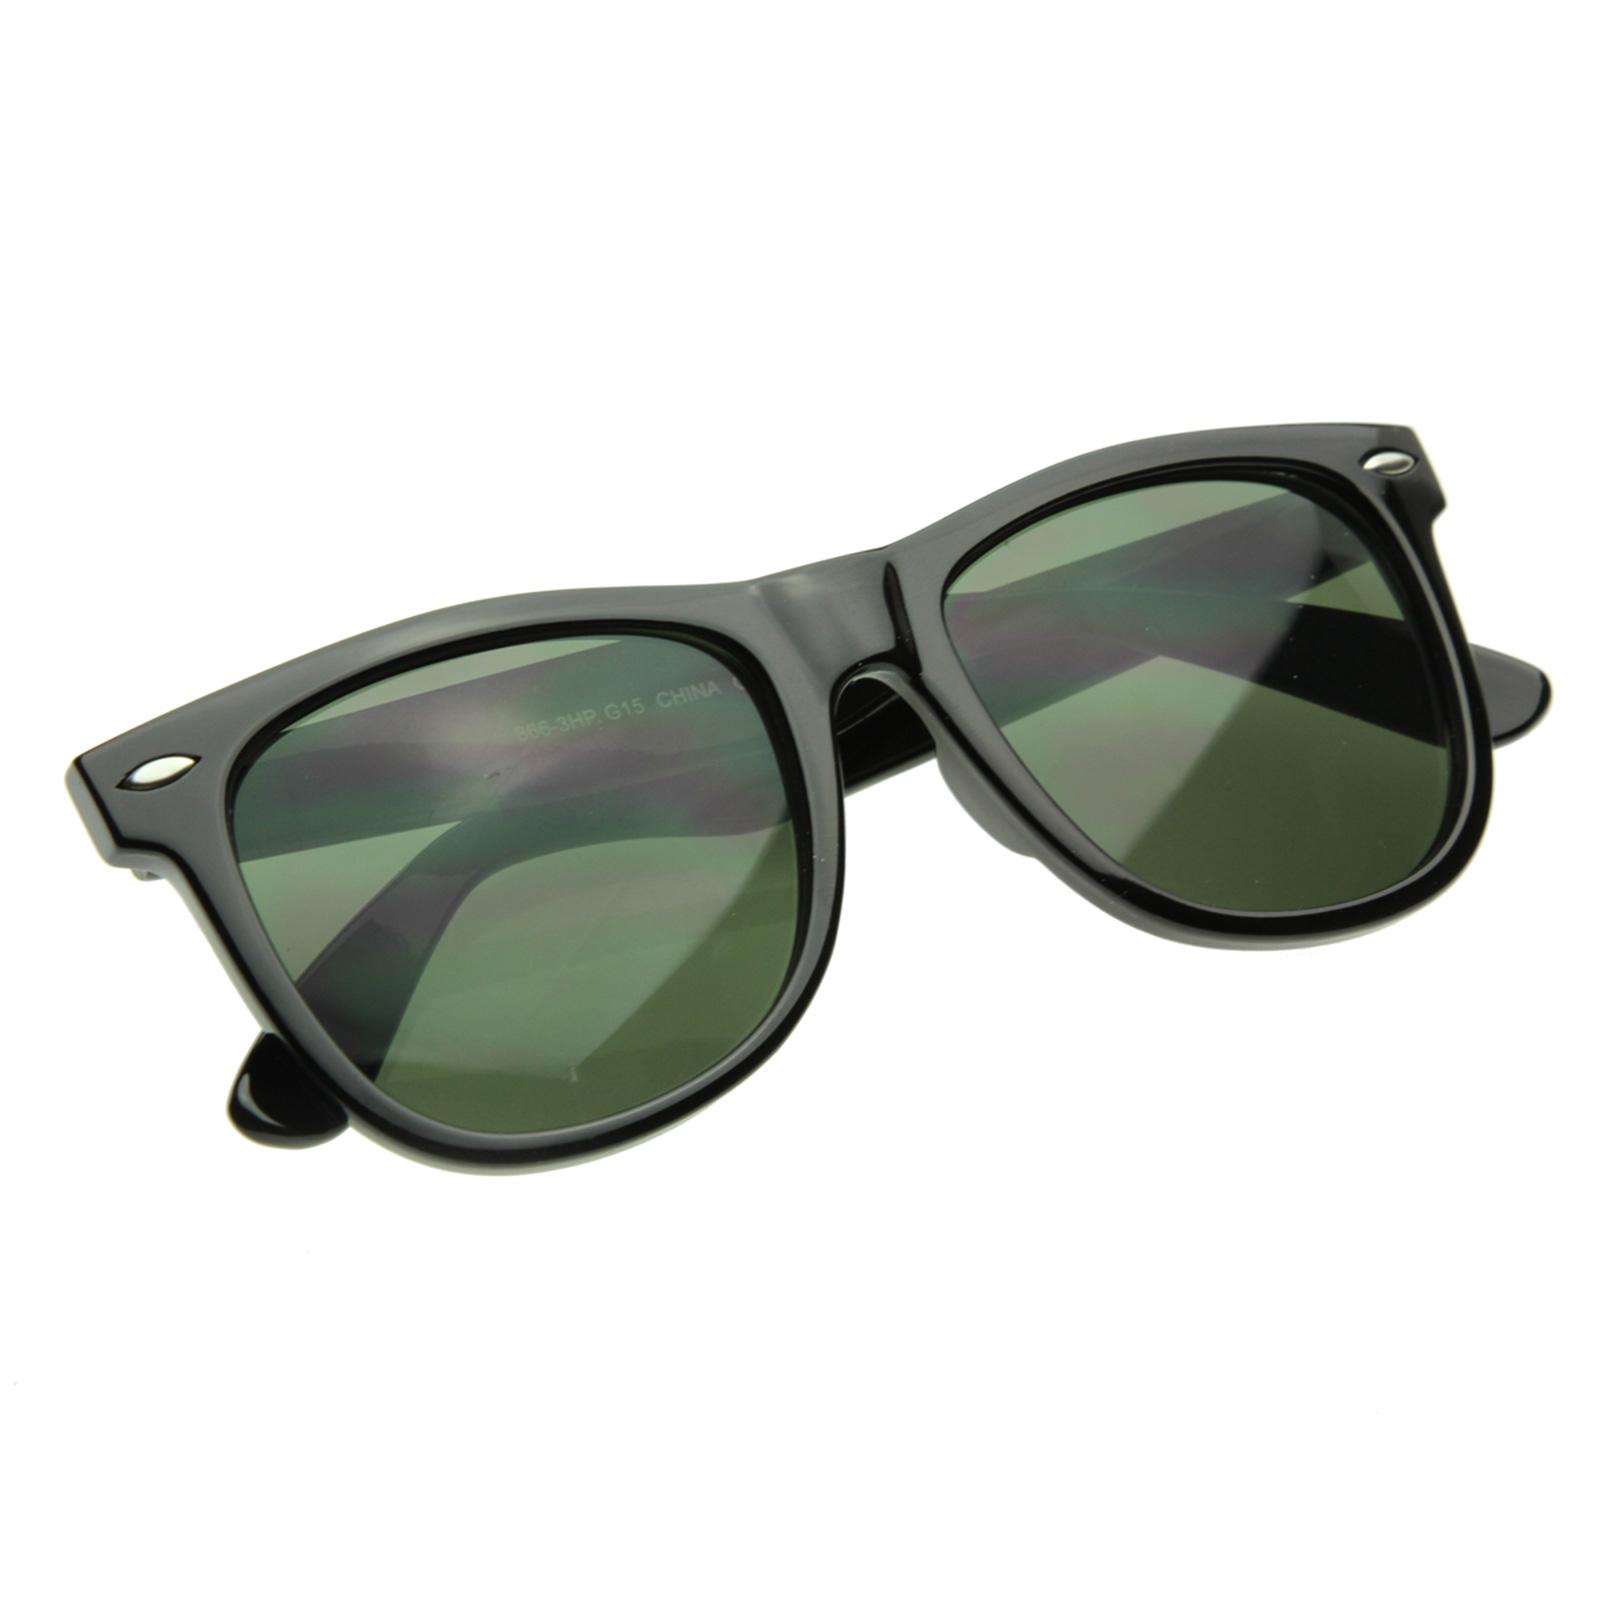 1980 Wayfarer Sunglasses